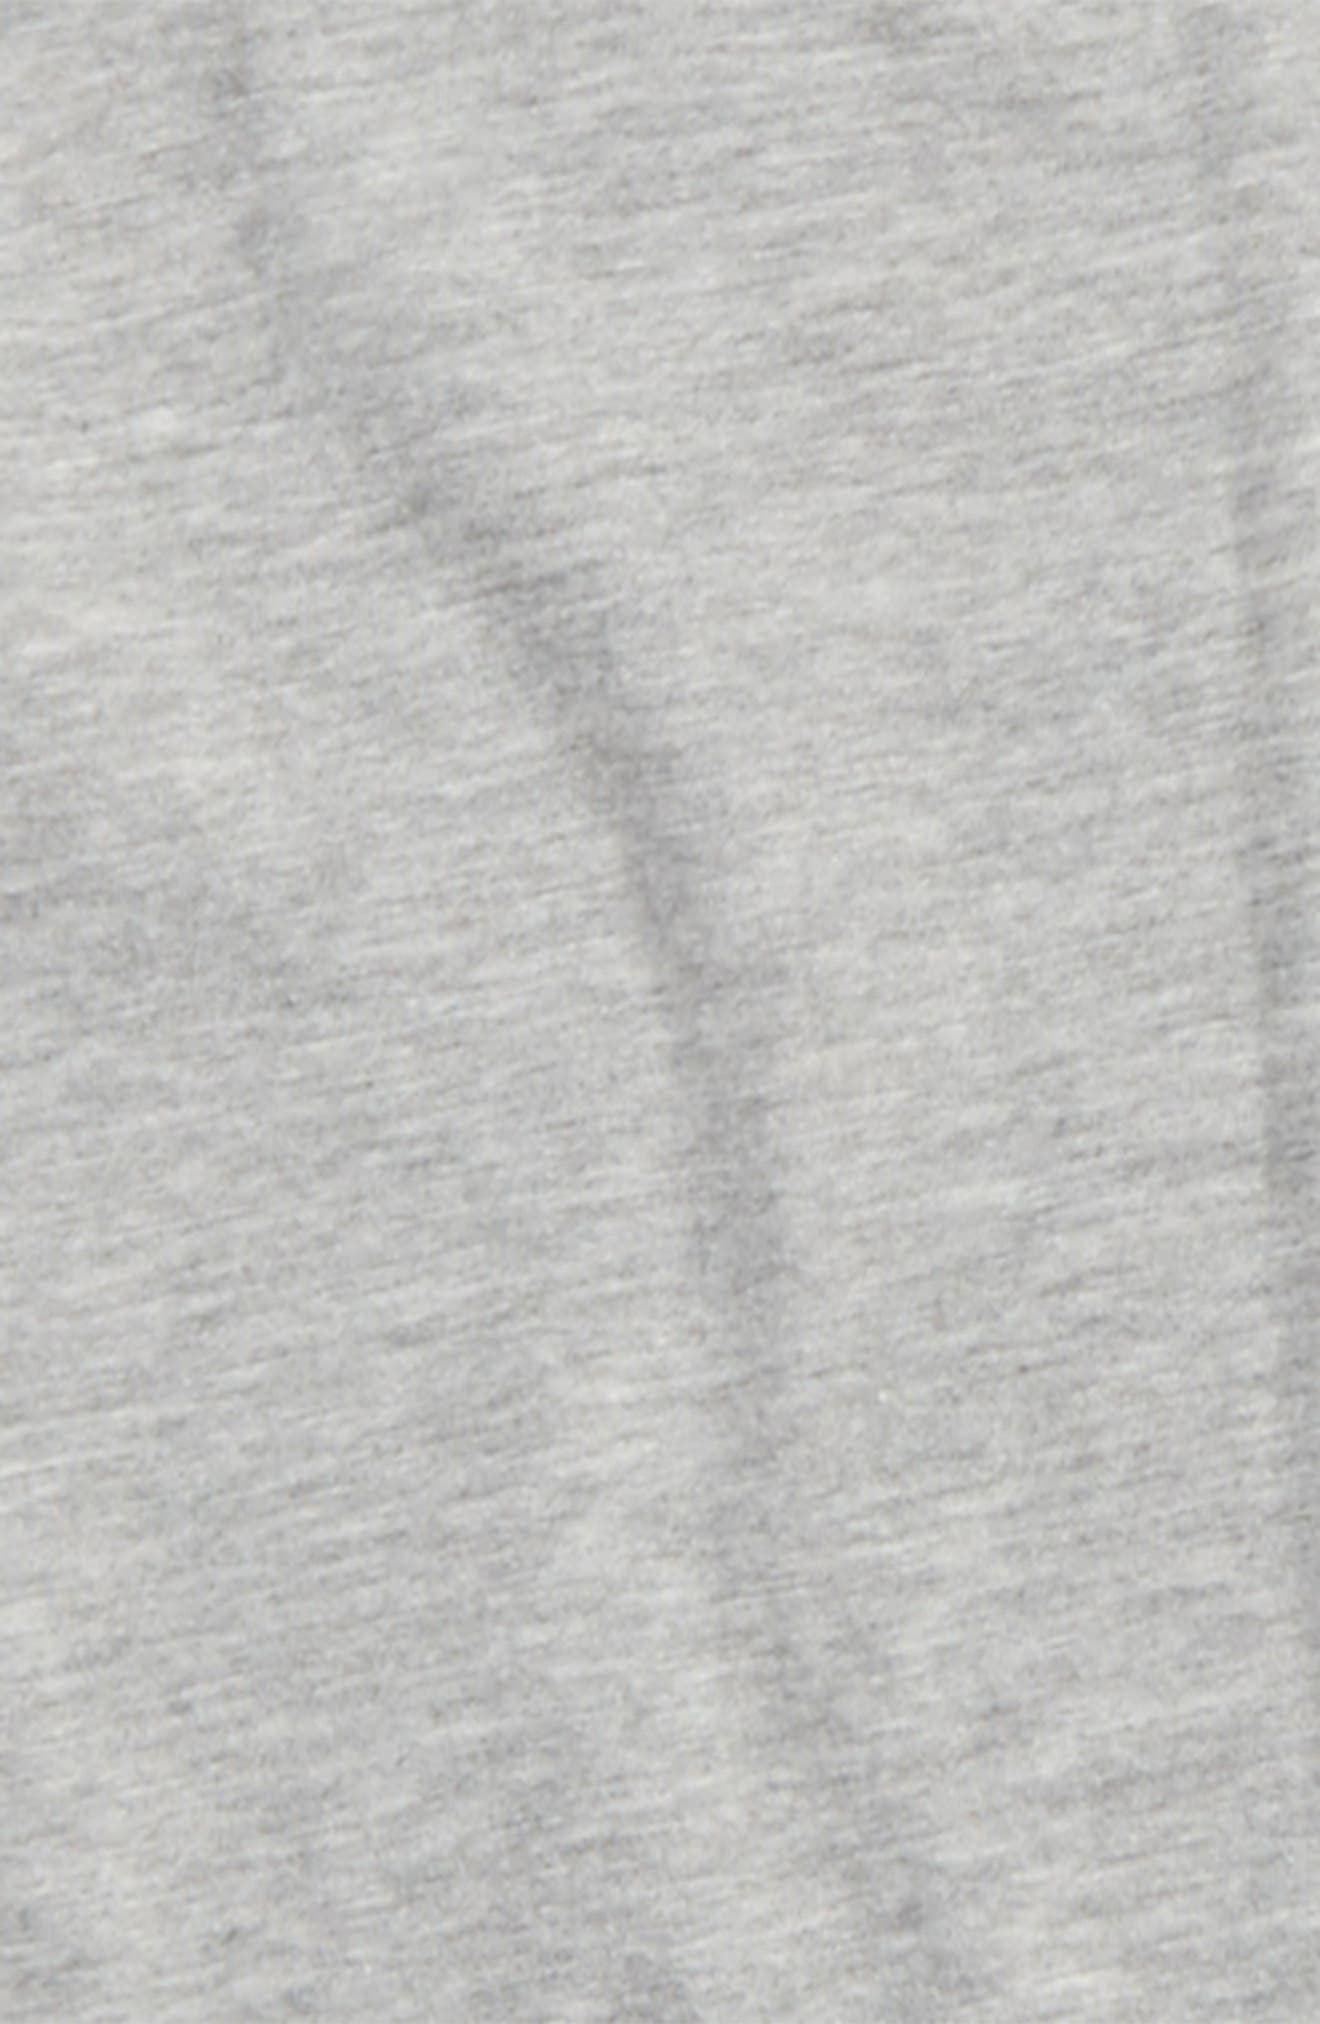 Alternate Image 3  - Tucker + Tate Embroidered Back Shirt (Big Girls)